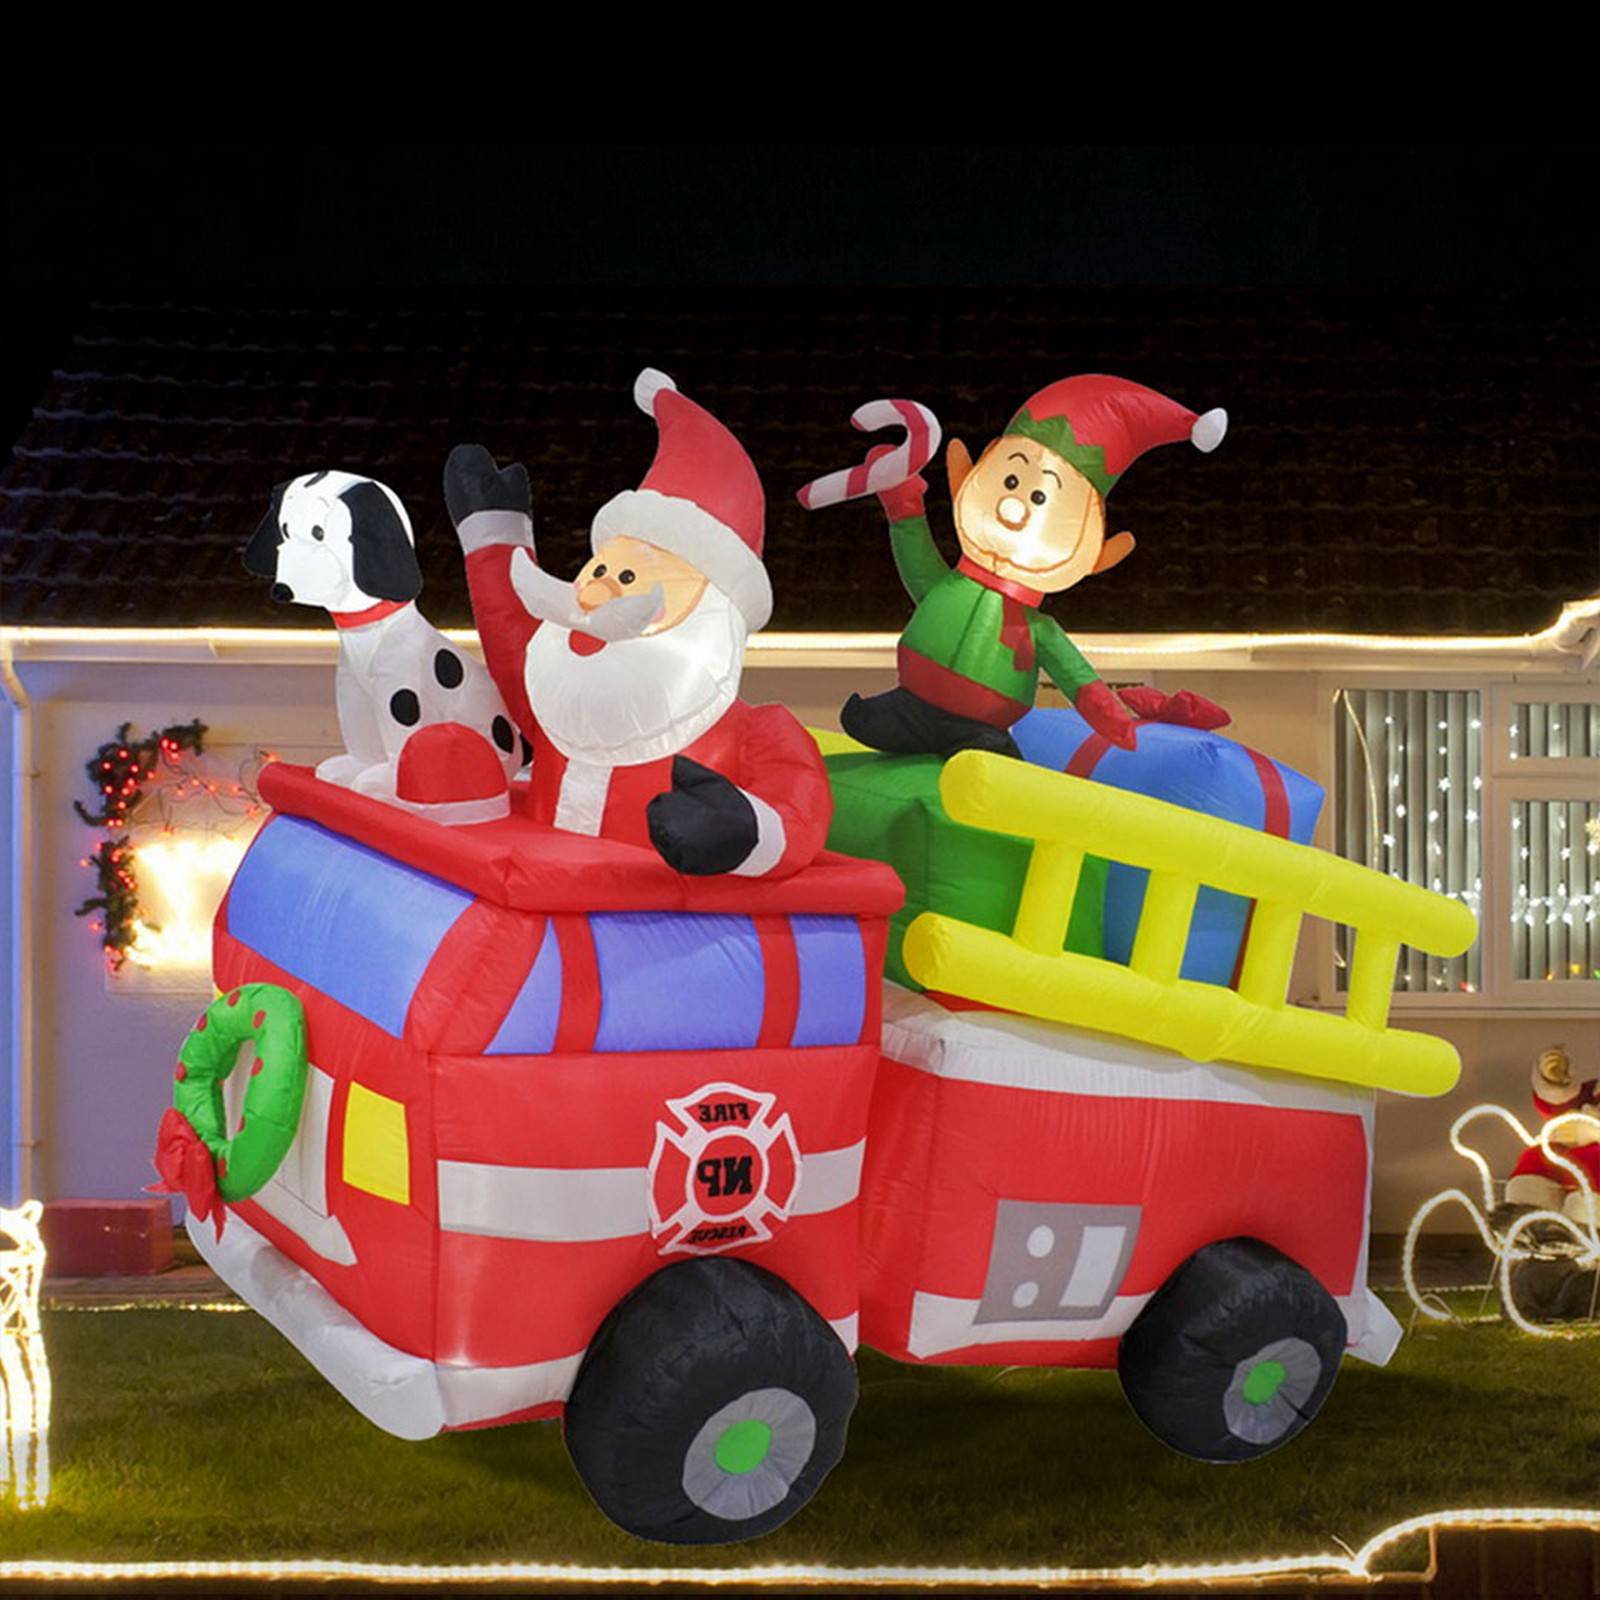 Airpower Santa 'N Friends Fire Engine - Cool White Led